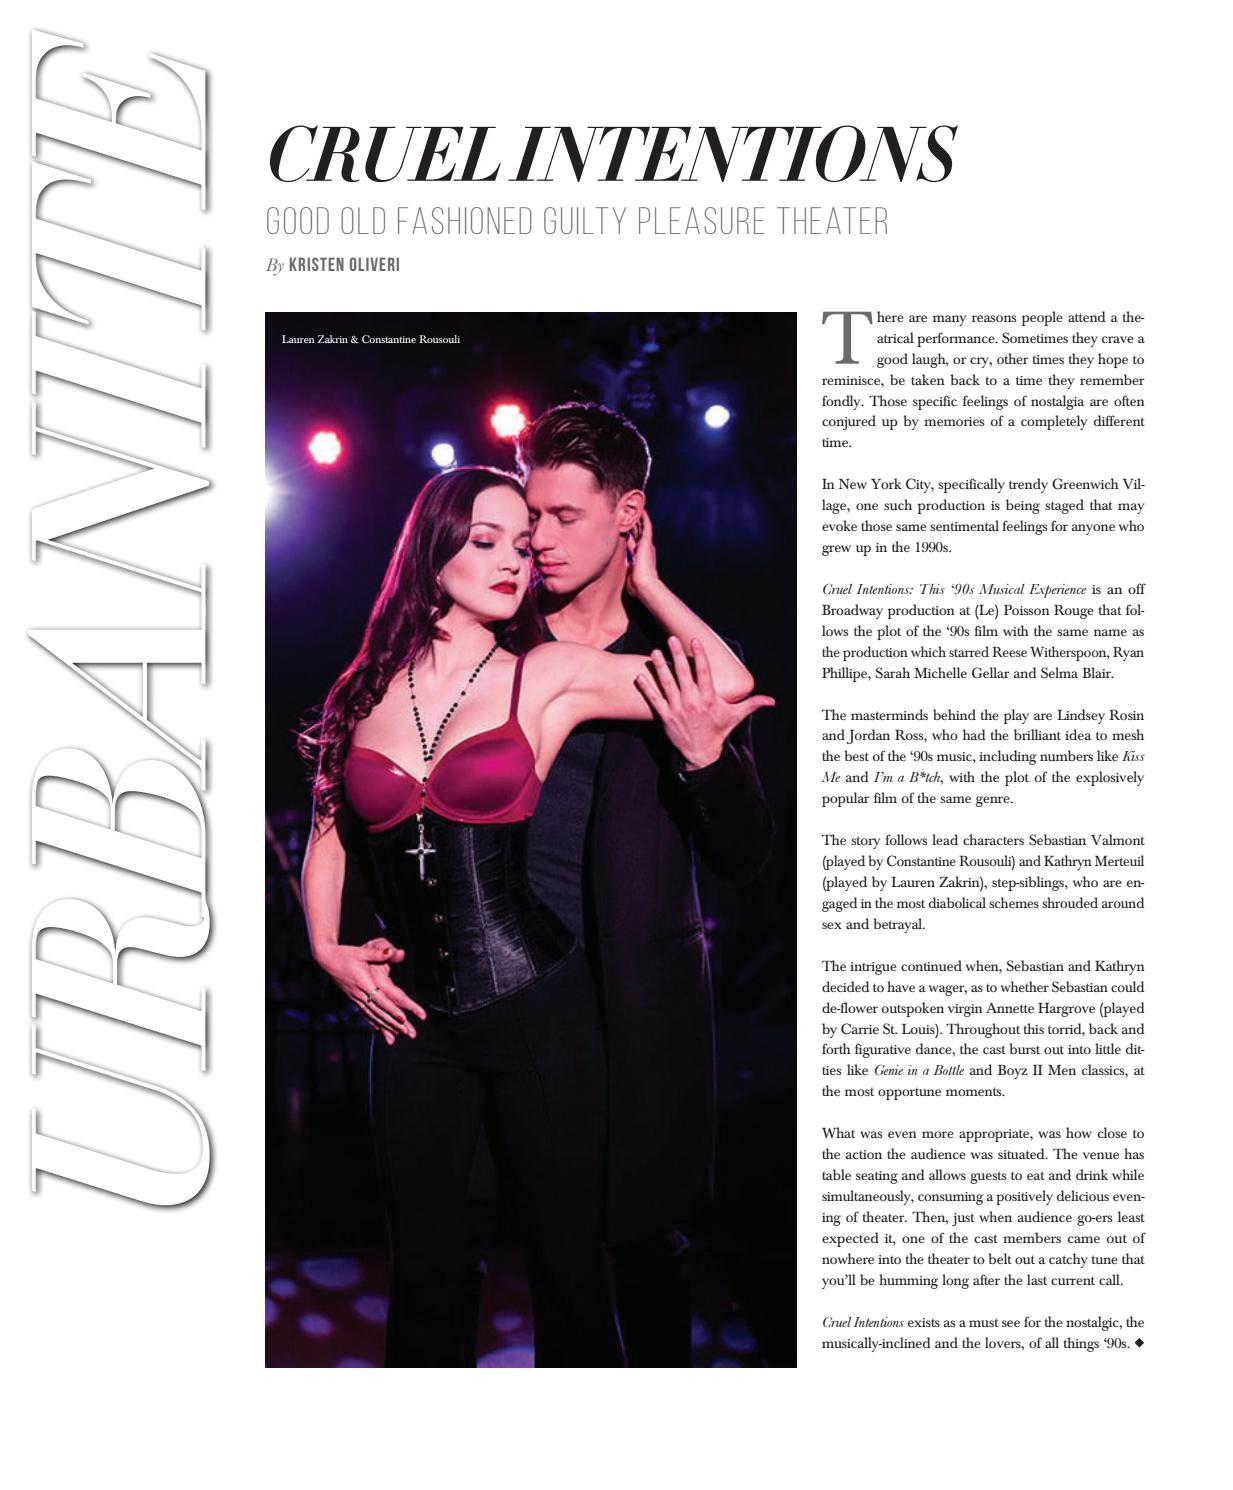 Resident Magazine February 2018 Issue - Annie Wersching by